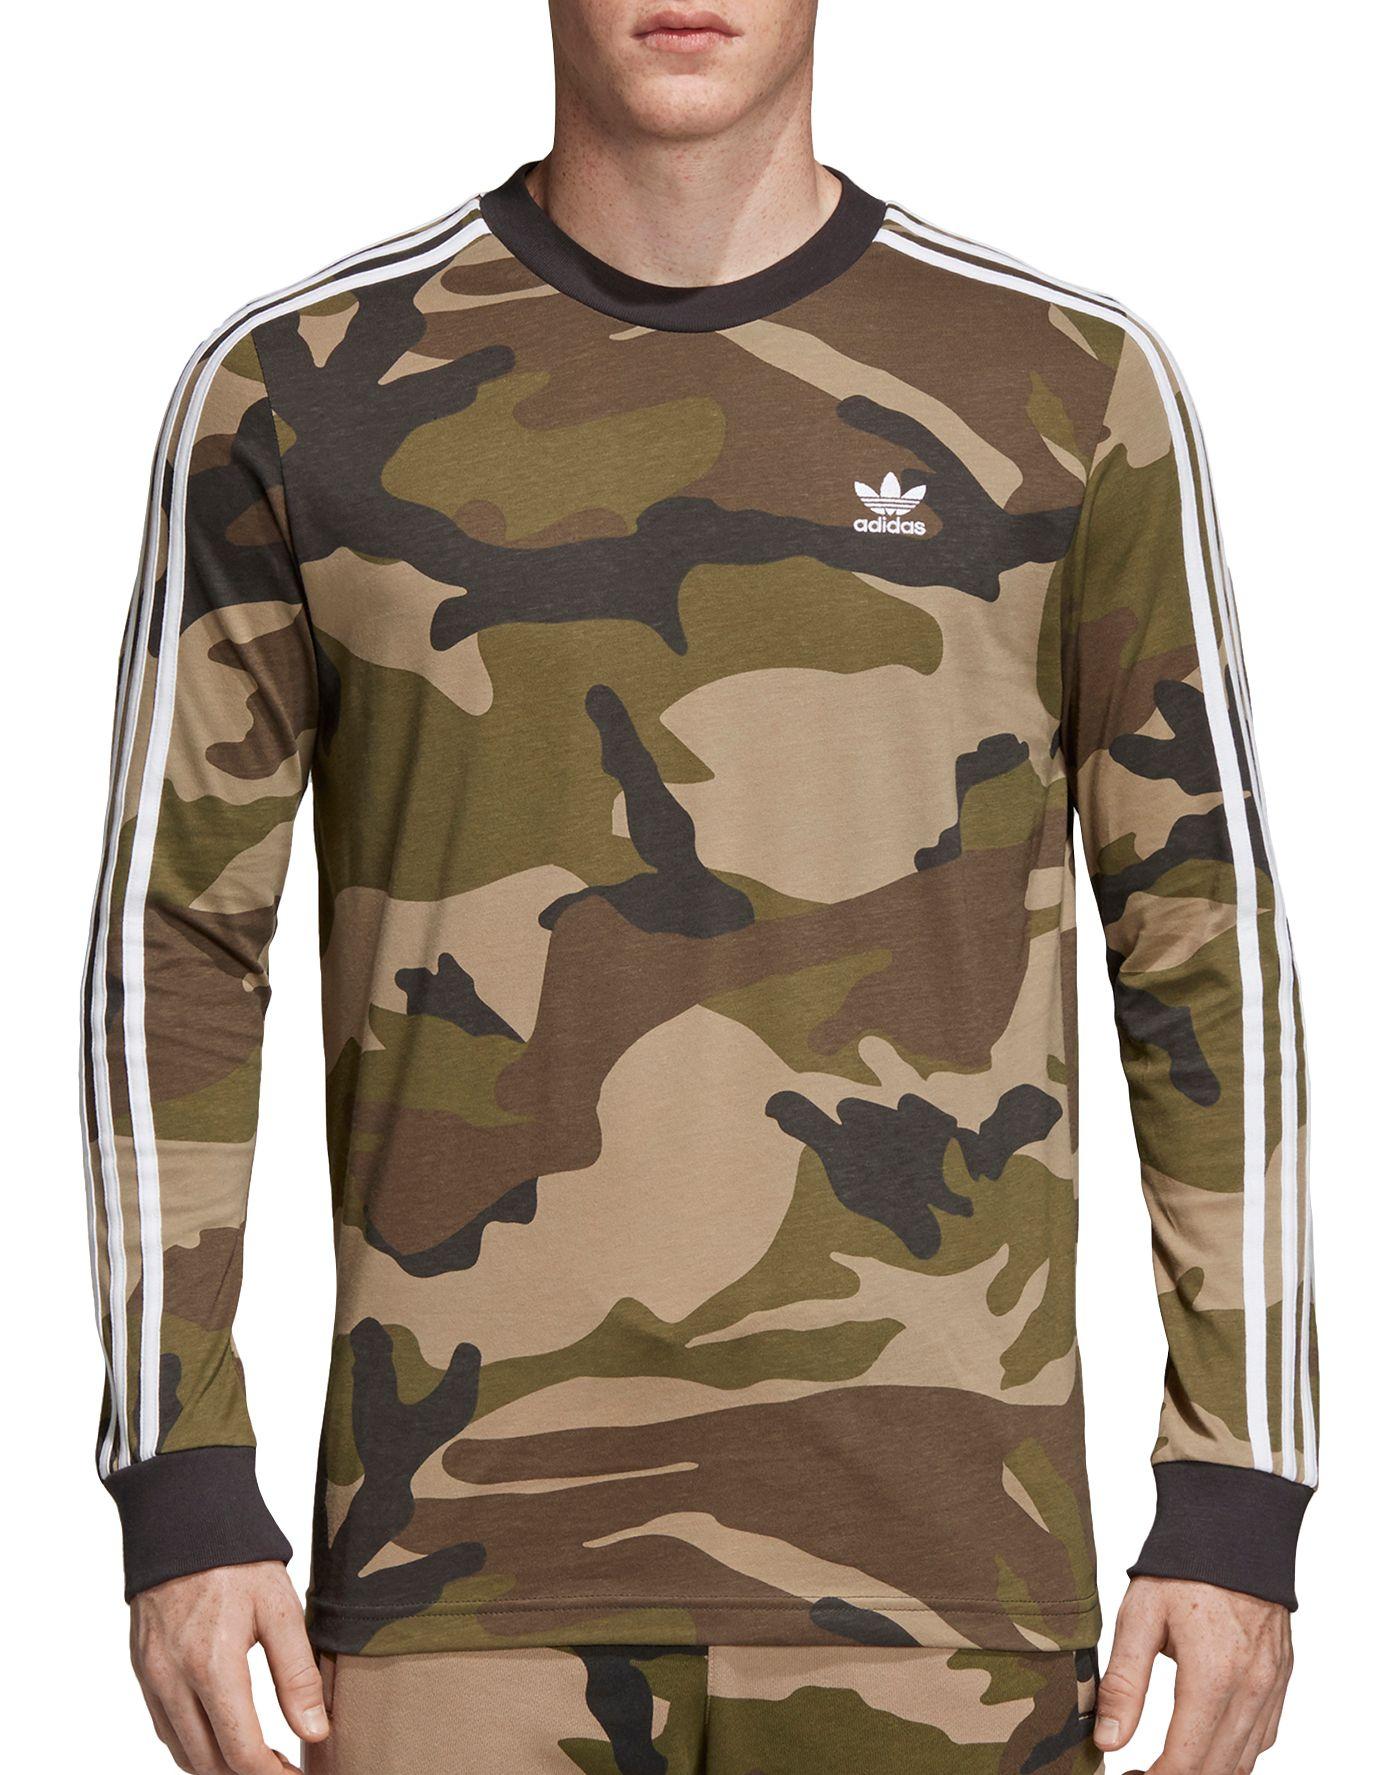 adidas Originals Men's Graphic Camouflage Long Sleeve Shirt